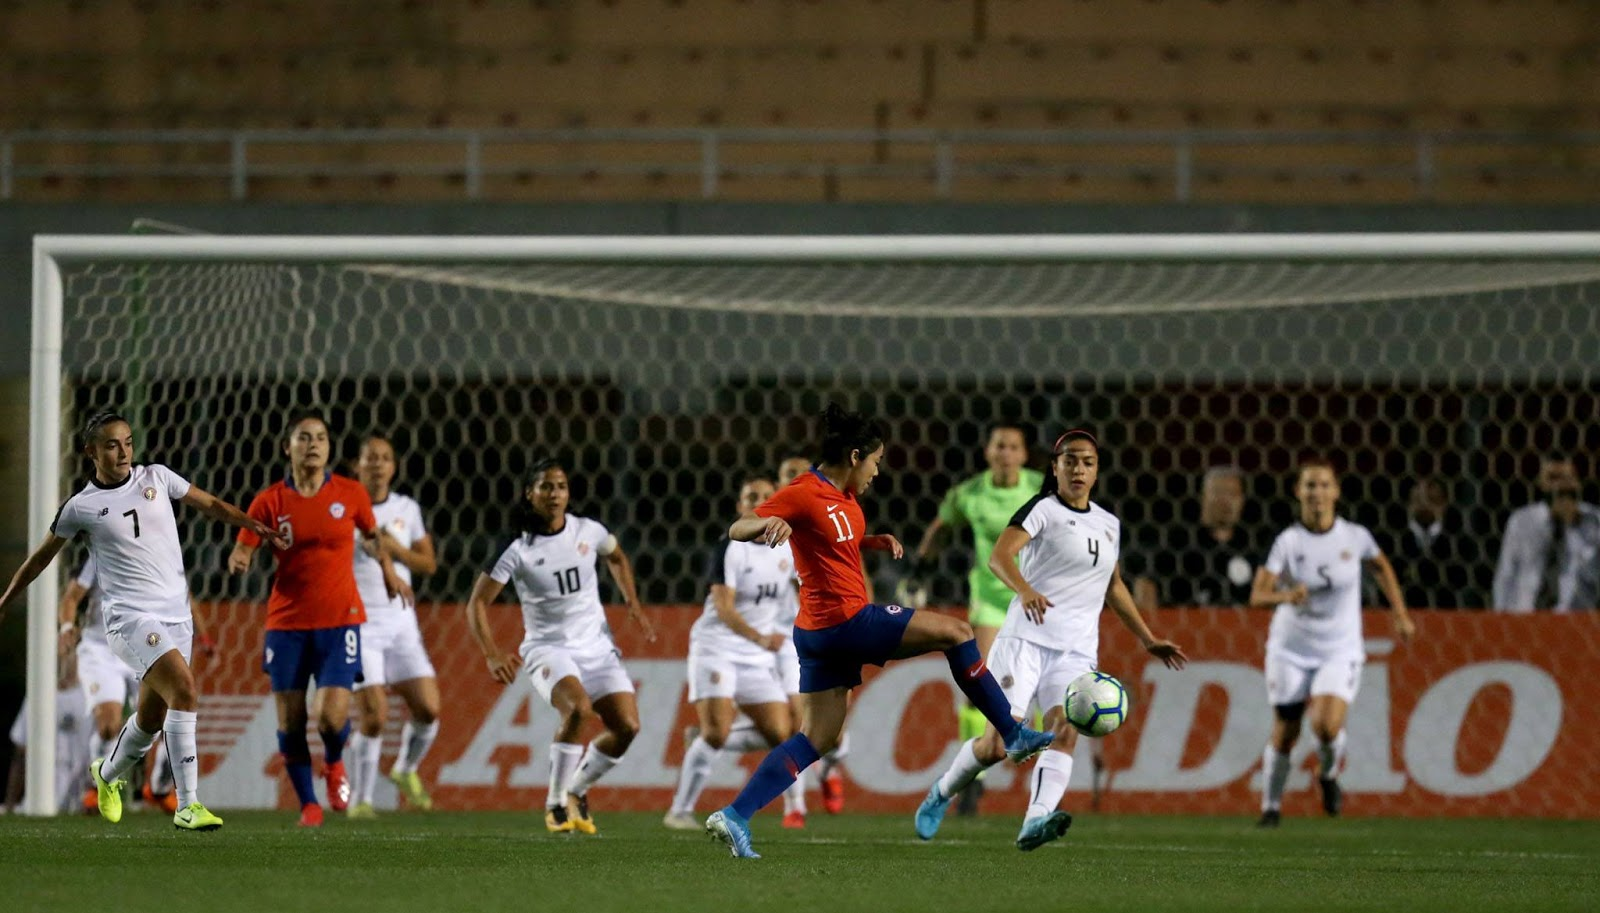 Costa Rica y Chile en Torneio Uber Internacional de Futebol Feminino de Seleções, 29 de agosto de 2019